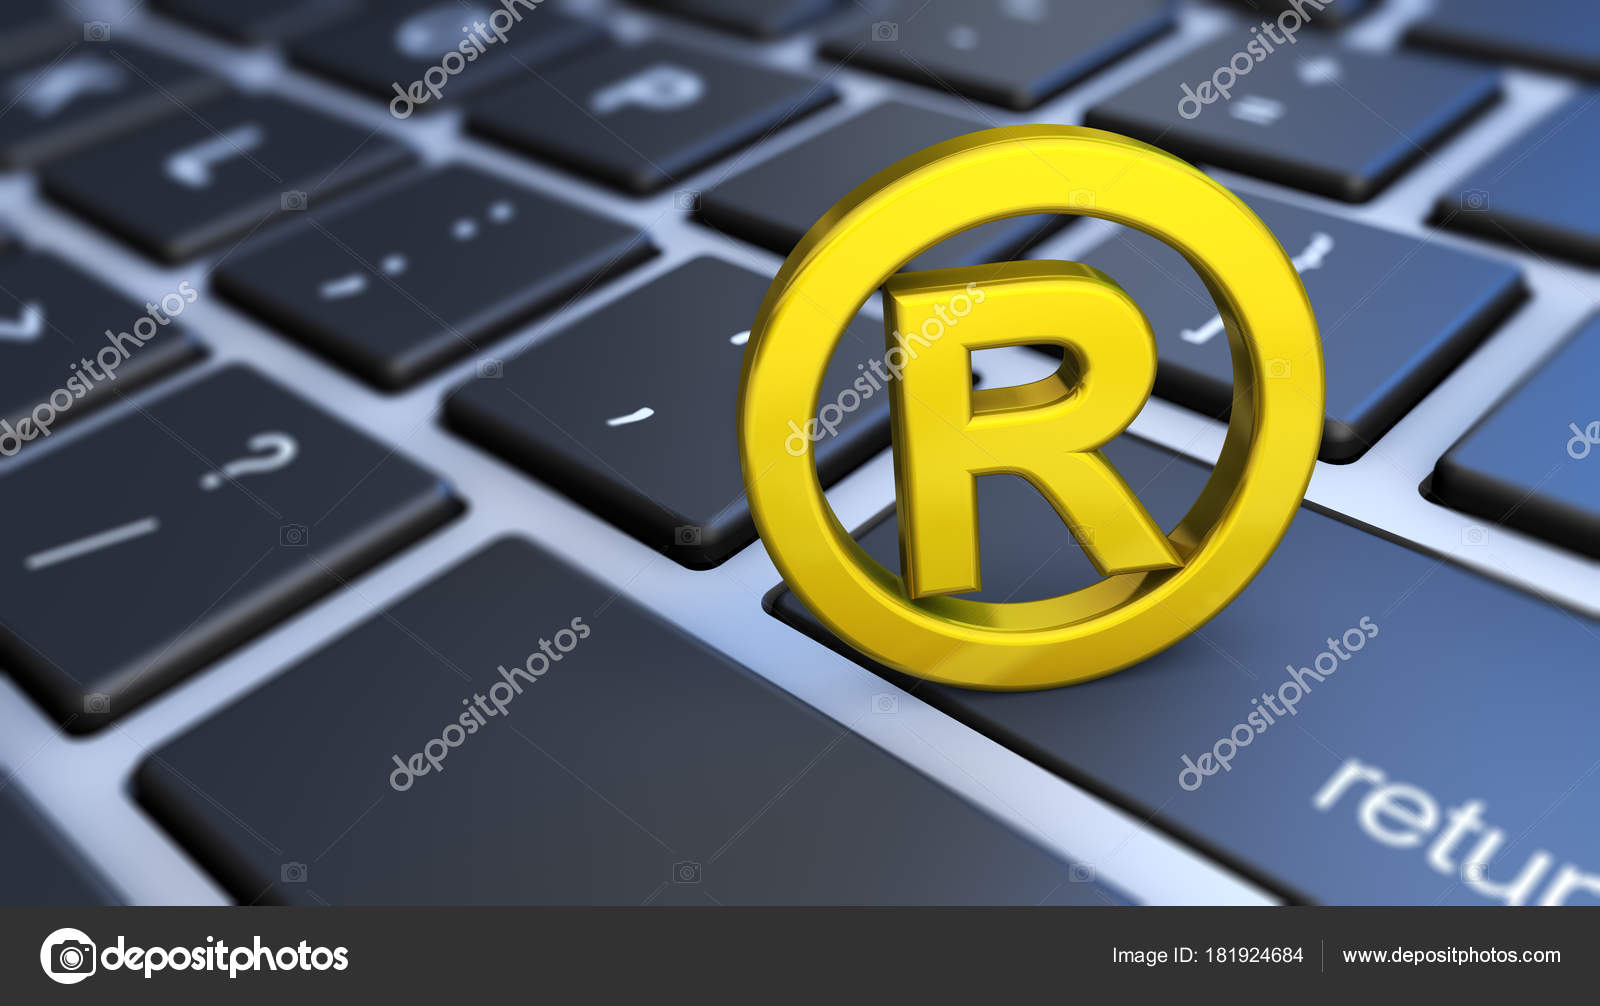 Registered Trademark Symbol Computer Keyboard Stock Photo